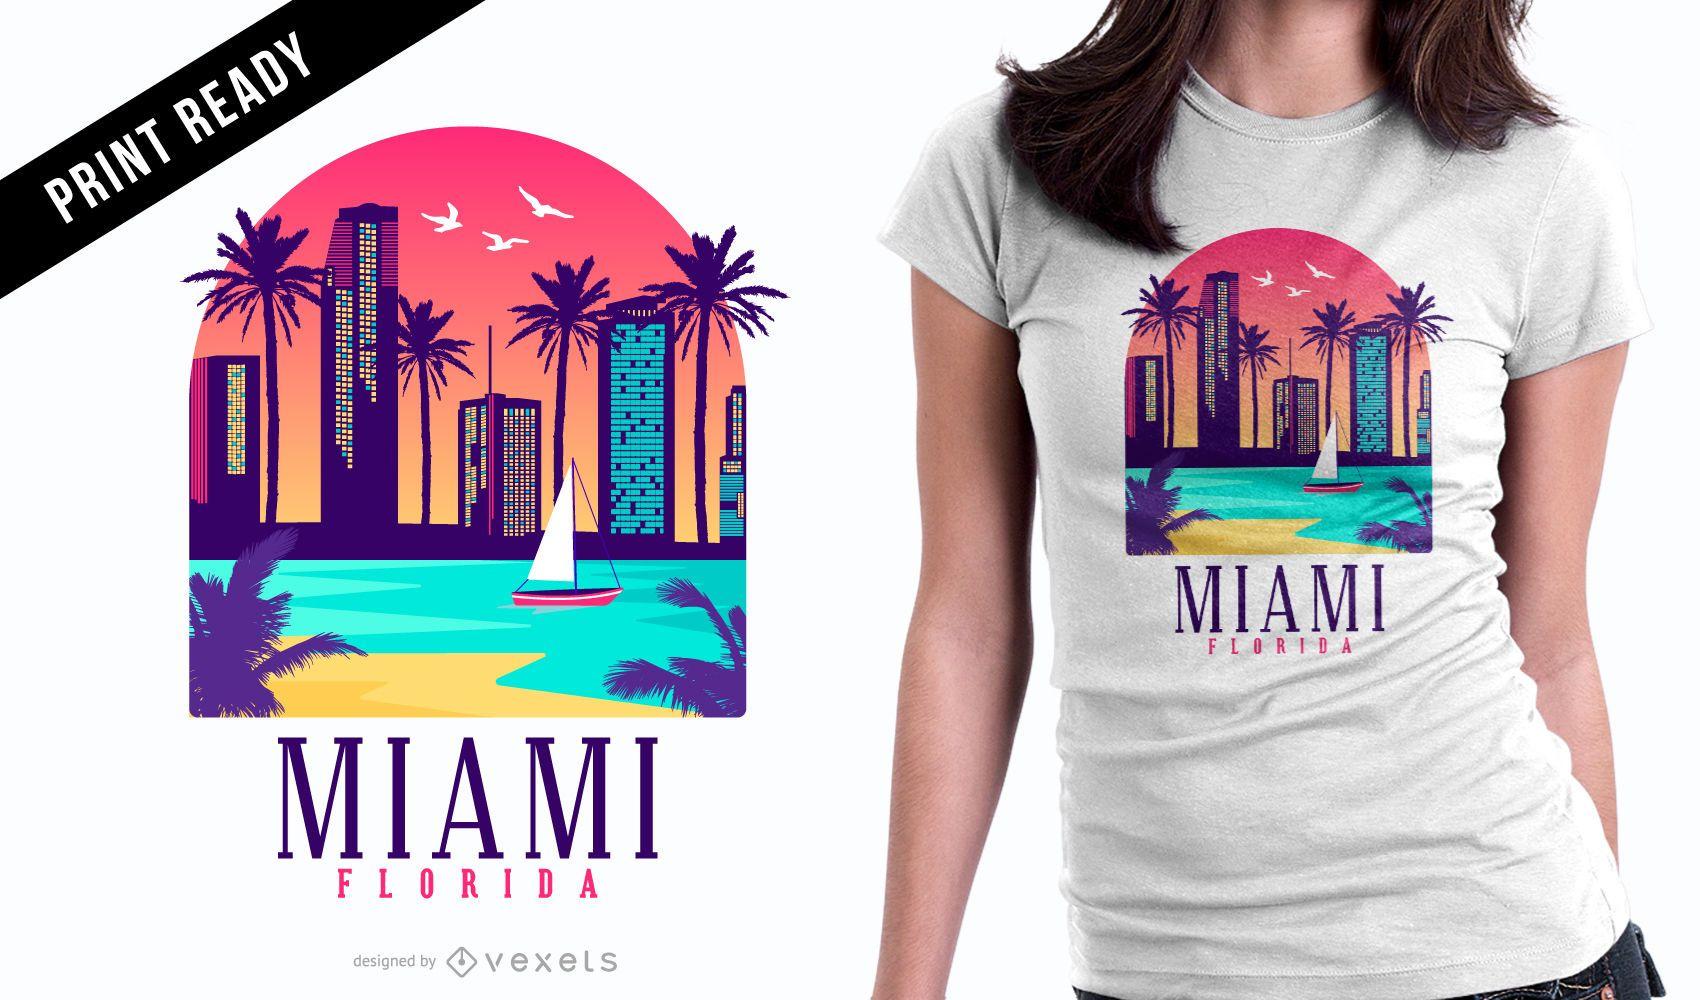 Diseño de camiseta de miami florida